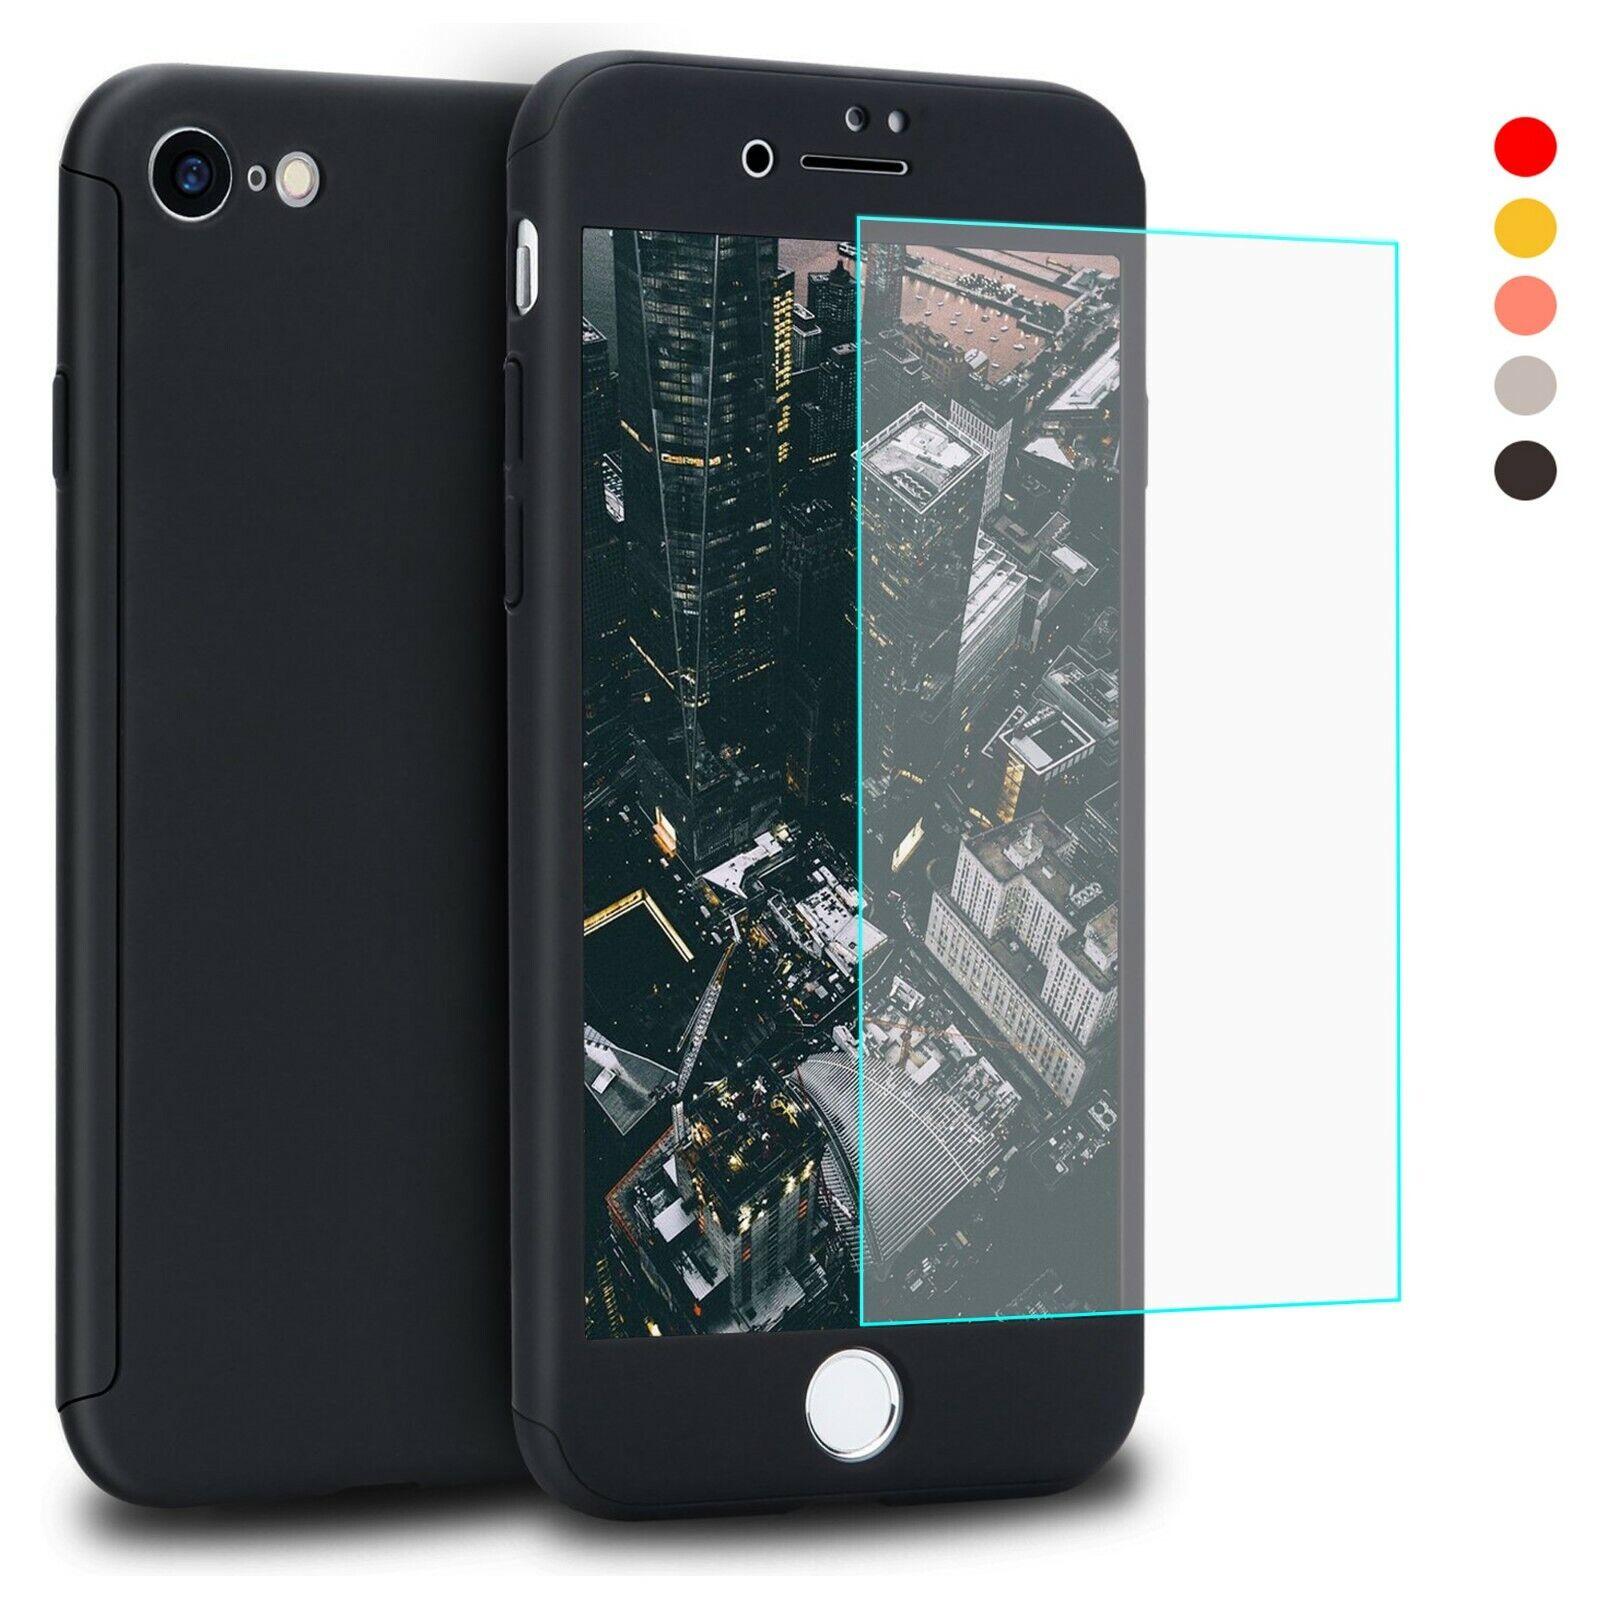 360 Grad Hülle iPhone 7 / 8 Plus Slim Handy Schutz Case Full Cover Glas Folie